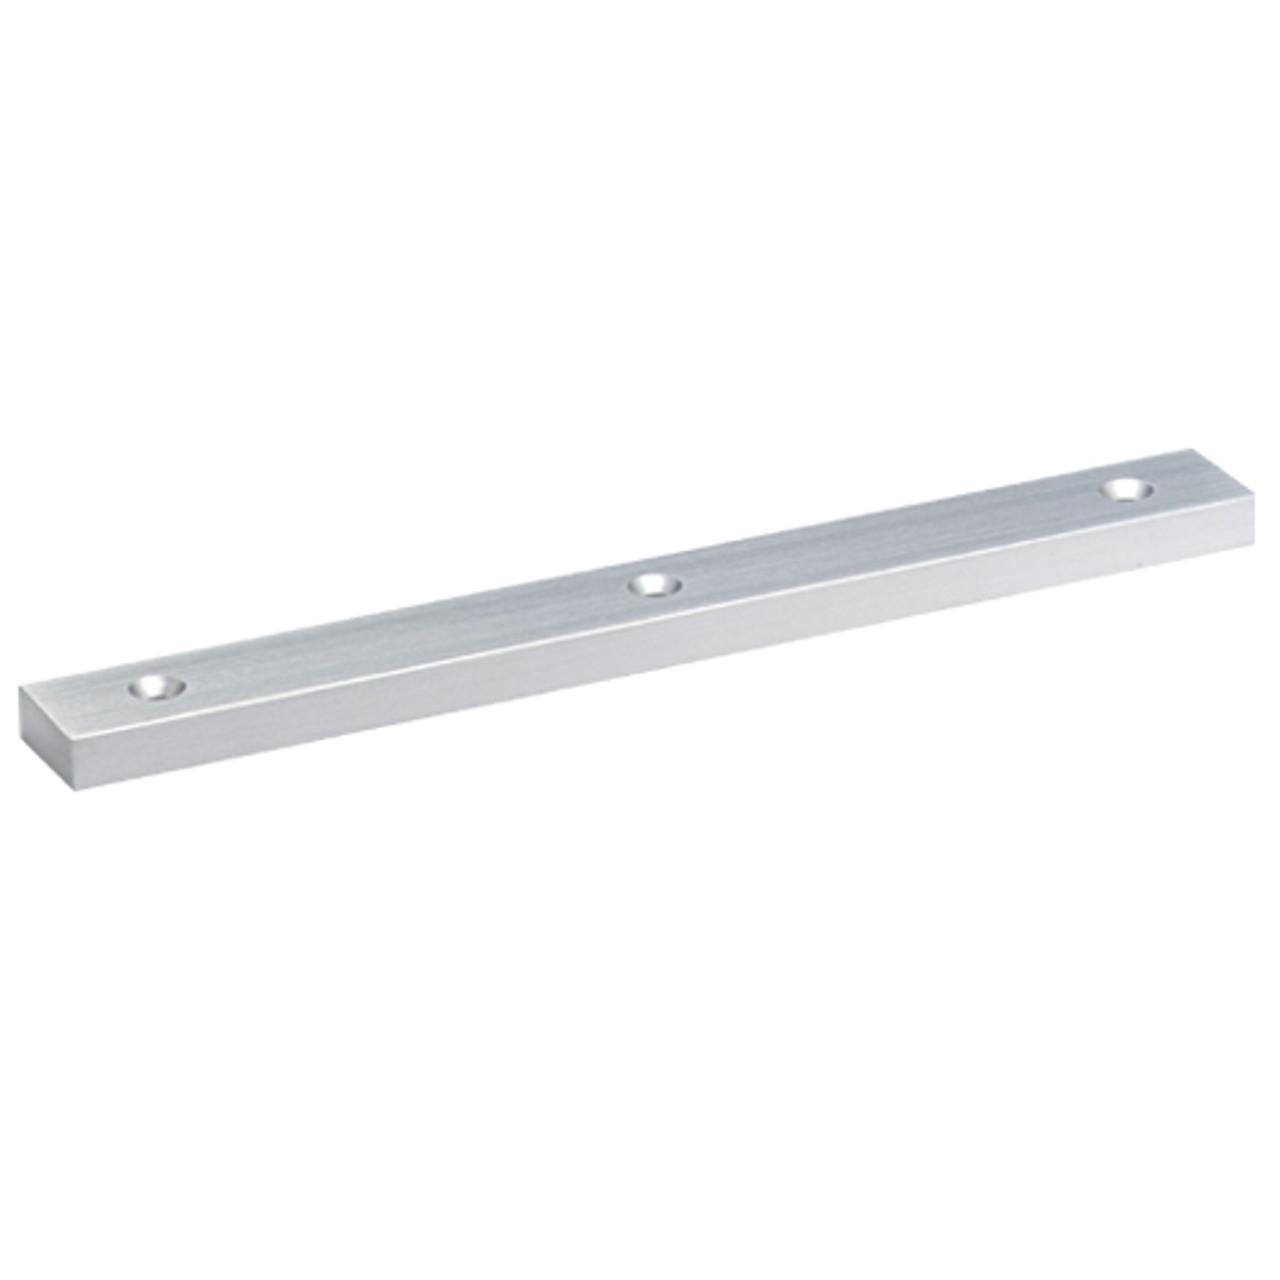 4014-US26 DynaLock 4000 Series Filler Plates for Single Maglocks in Bright Chrome